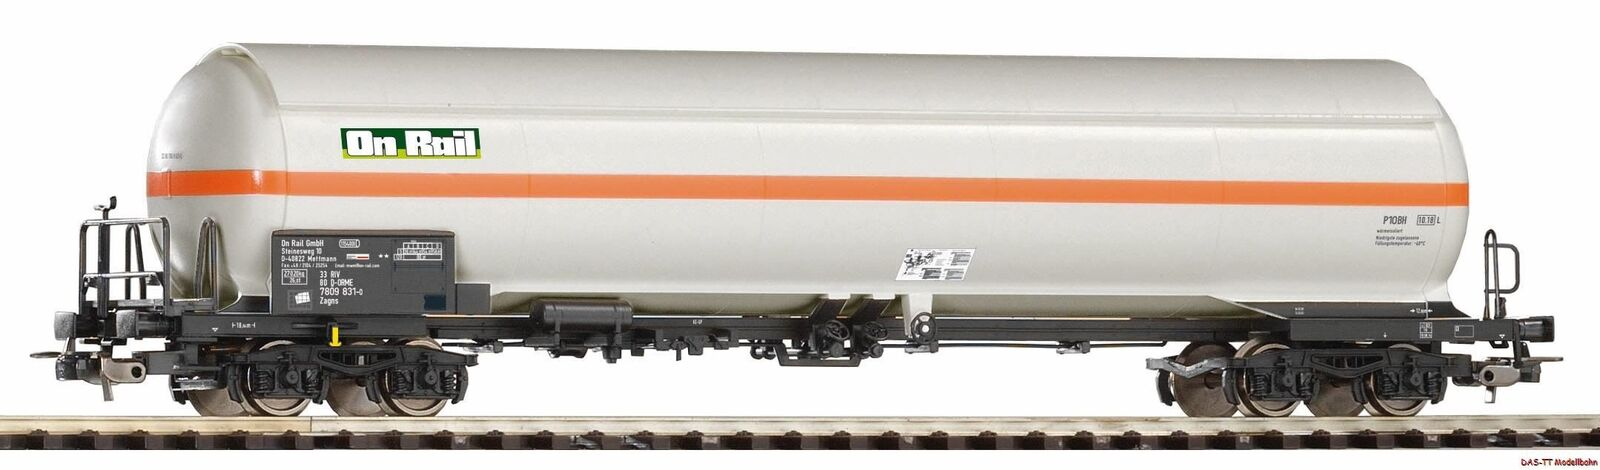 H0 druckgaskesselwagen onrail con techo EP. vi Piko 54669